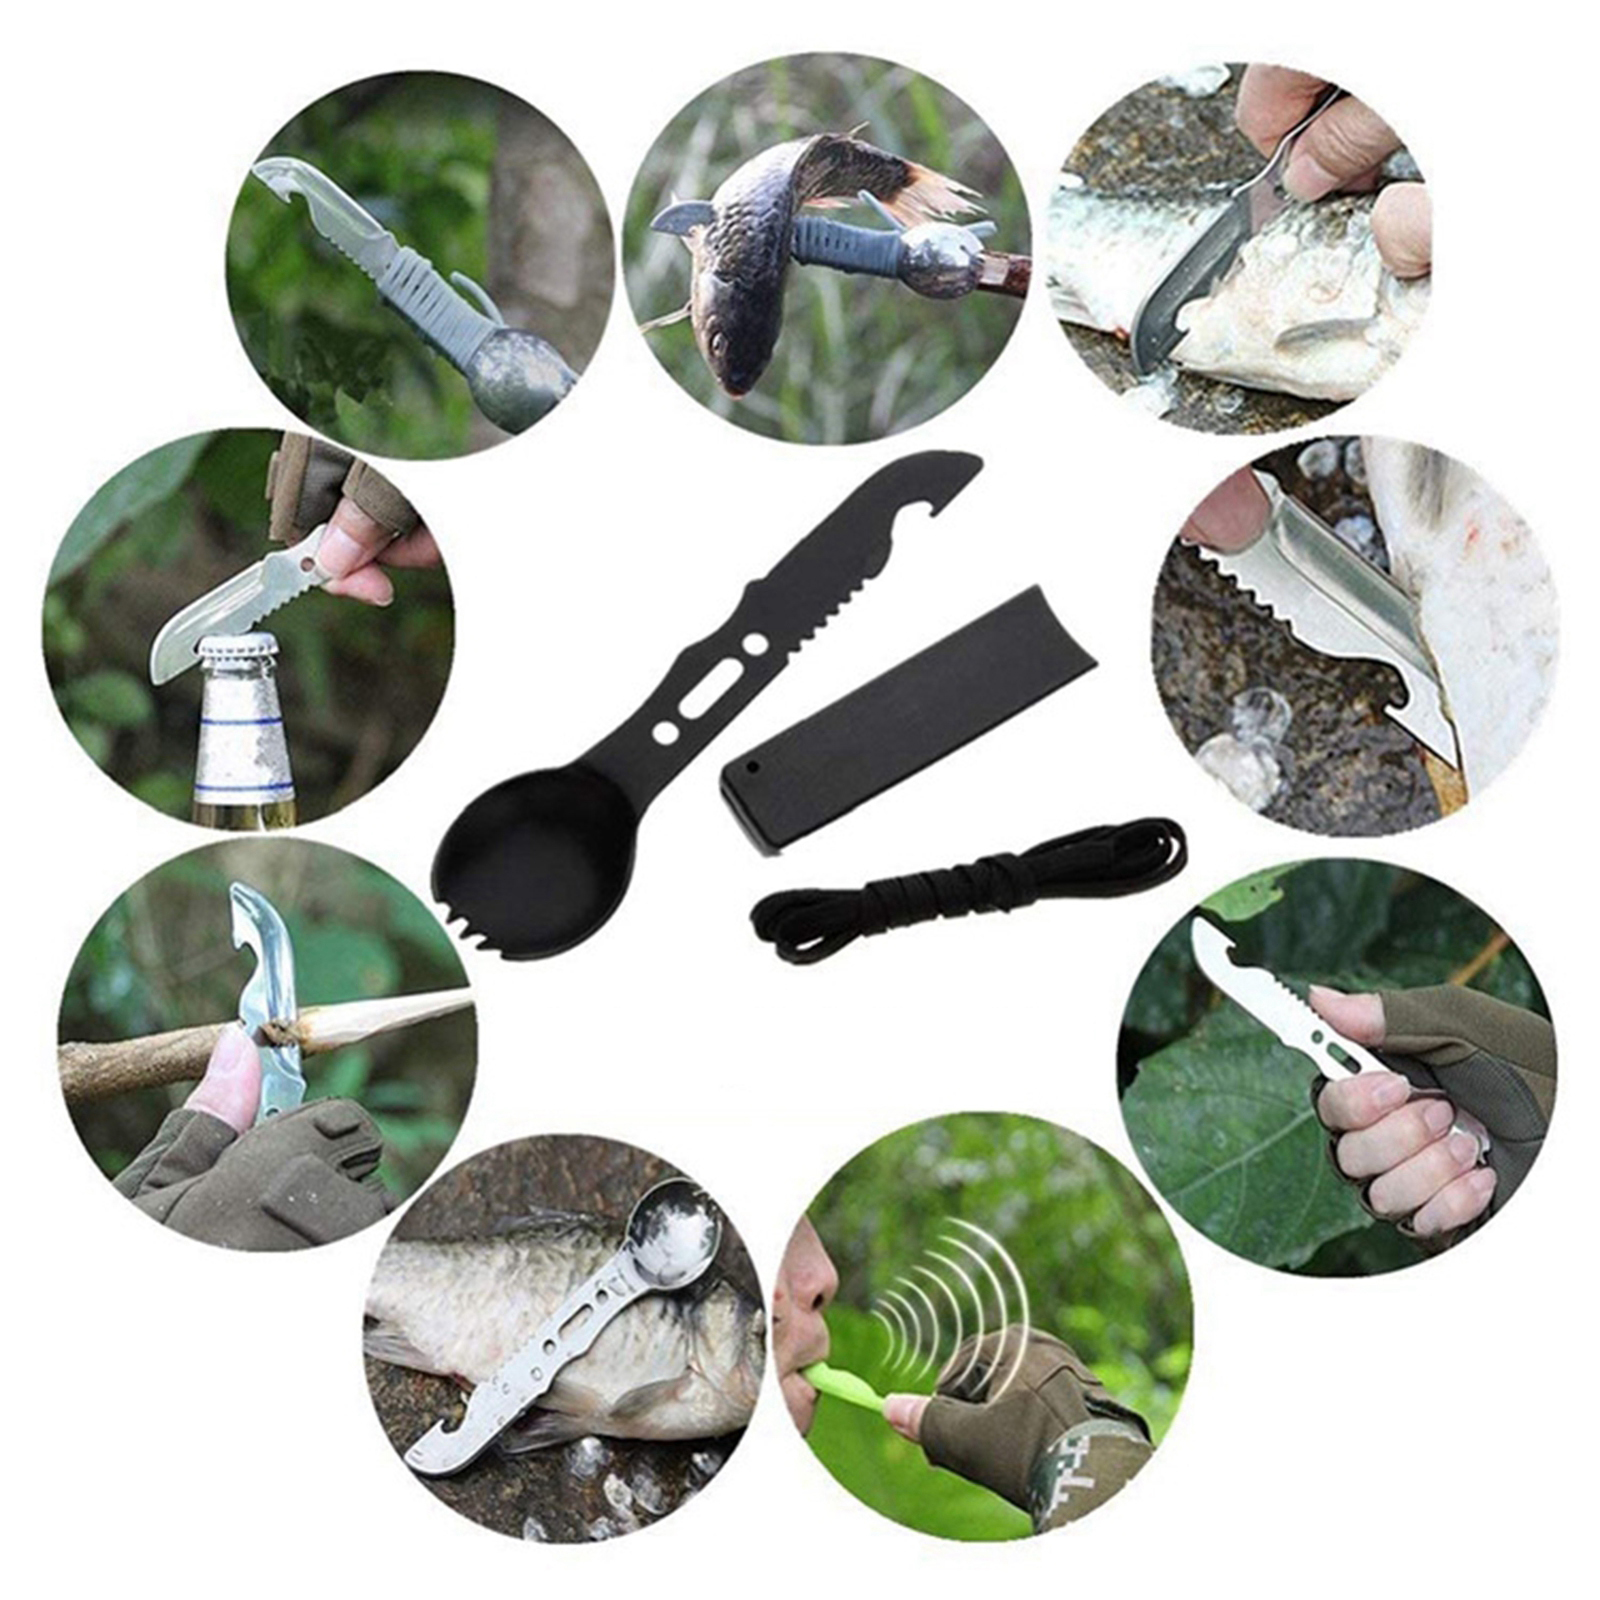 33pcs/set Outdoor Emergency Survival Gear Kit Camping SOS equipment  Christmas Blanket Hiking Essentials Bracelet Man